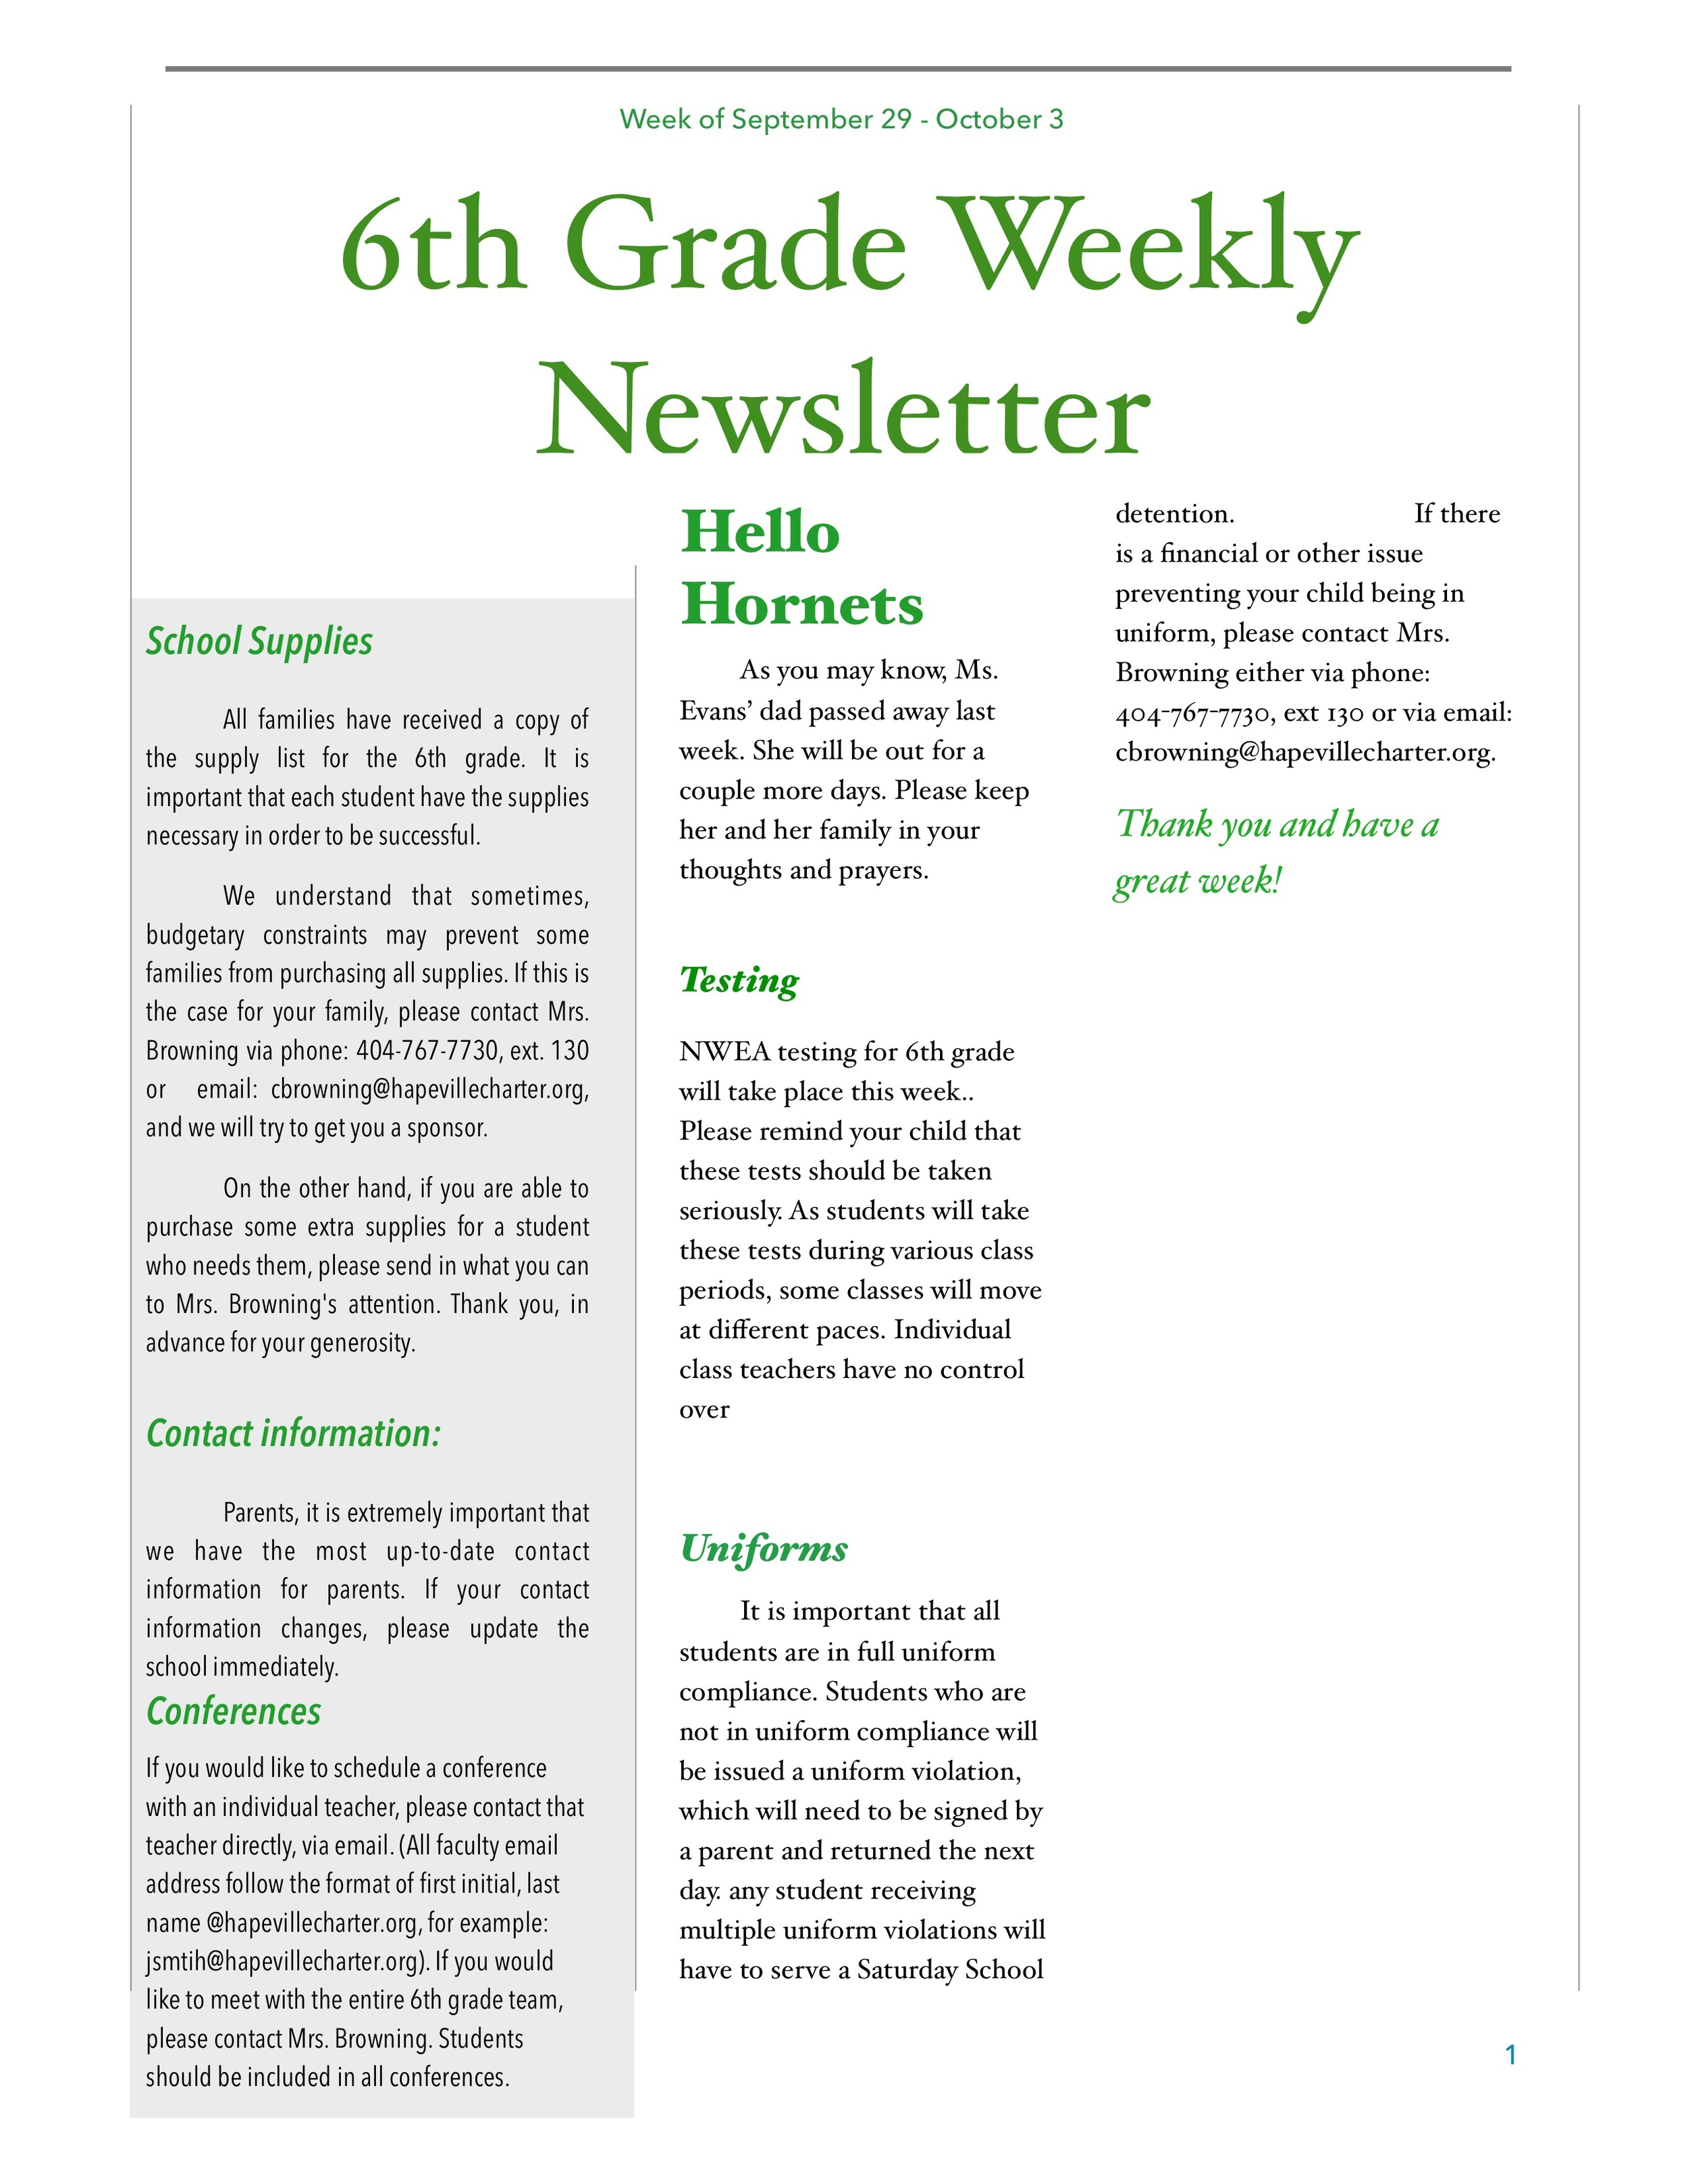 Newsletter Image6th grade 9-29.jpeg